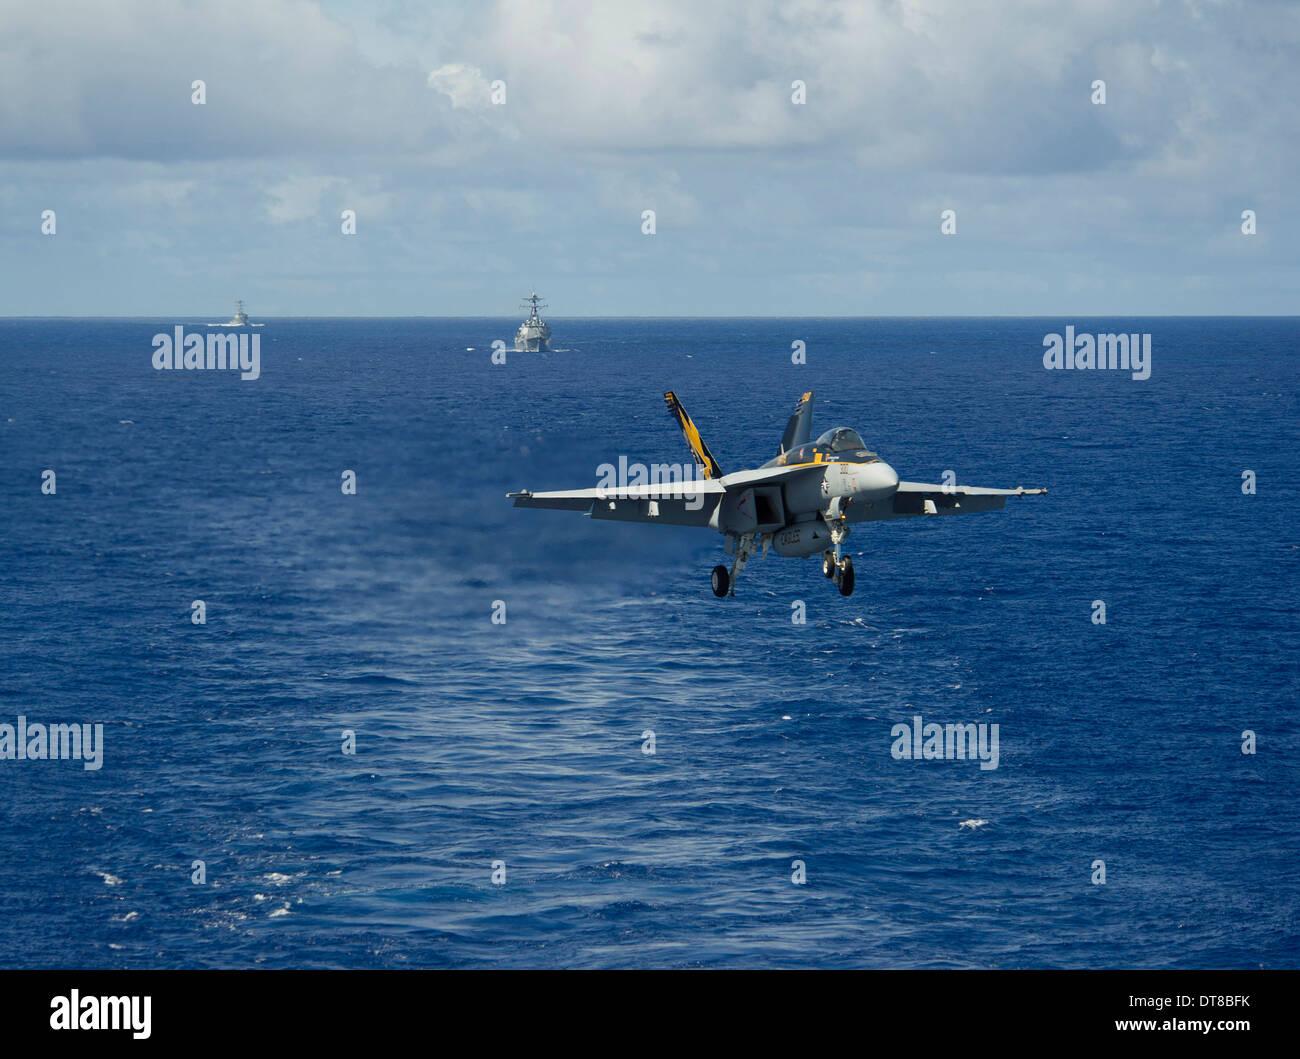 n F/A-18E Super Hornet prepares to make an arrested landing. - Stock Image